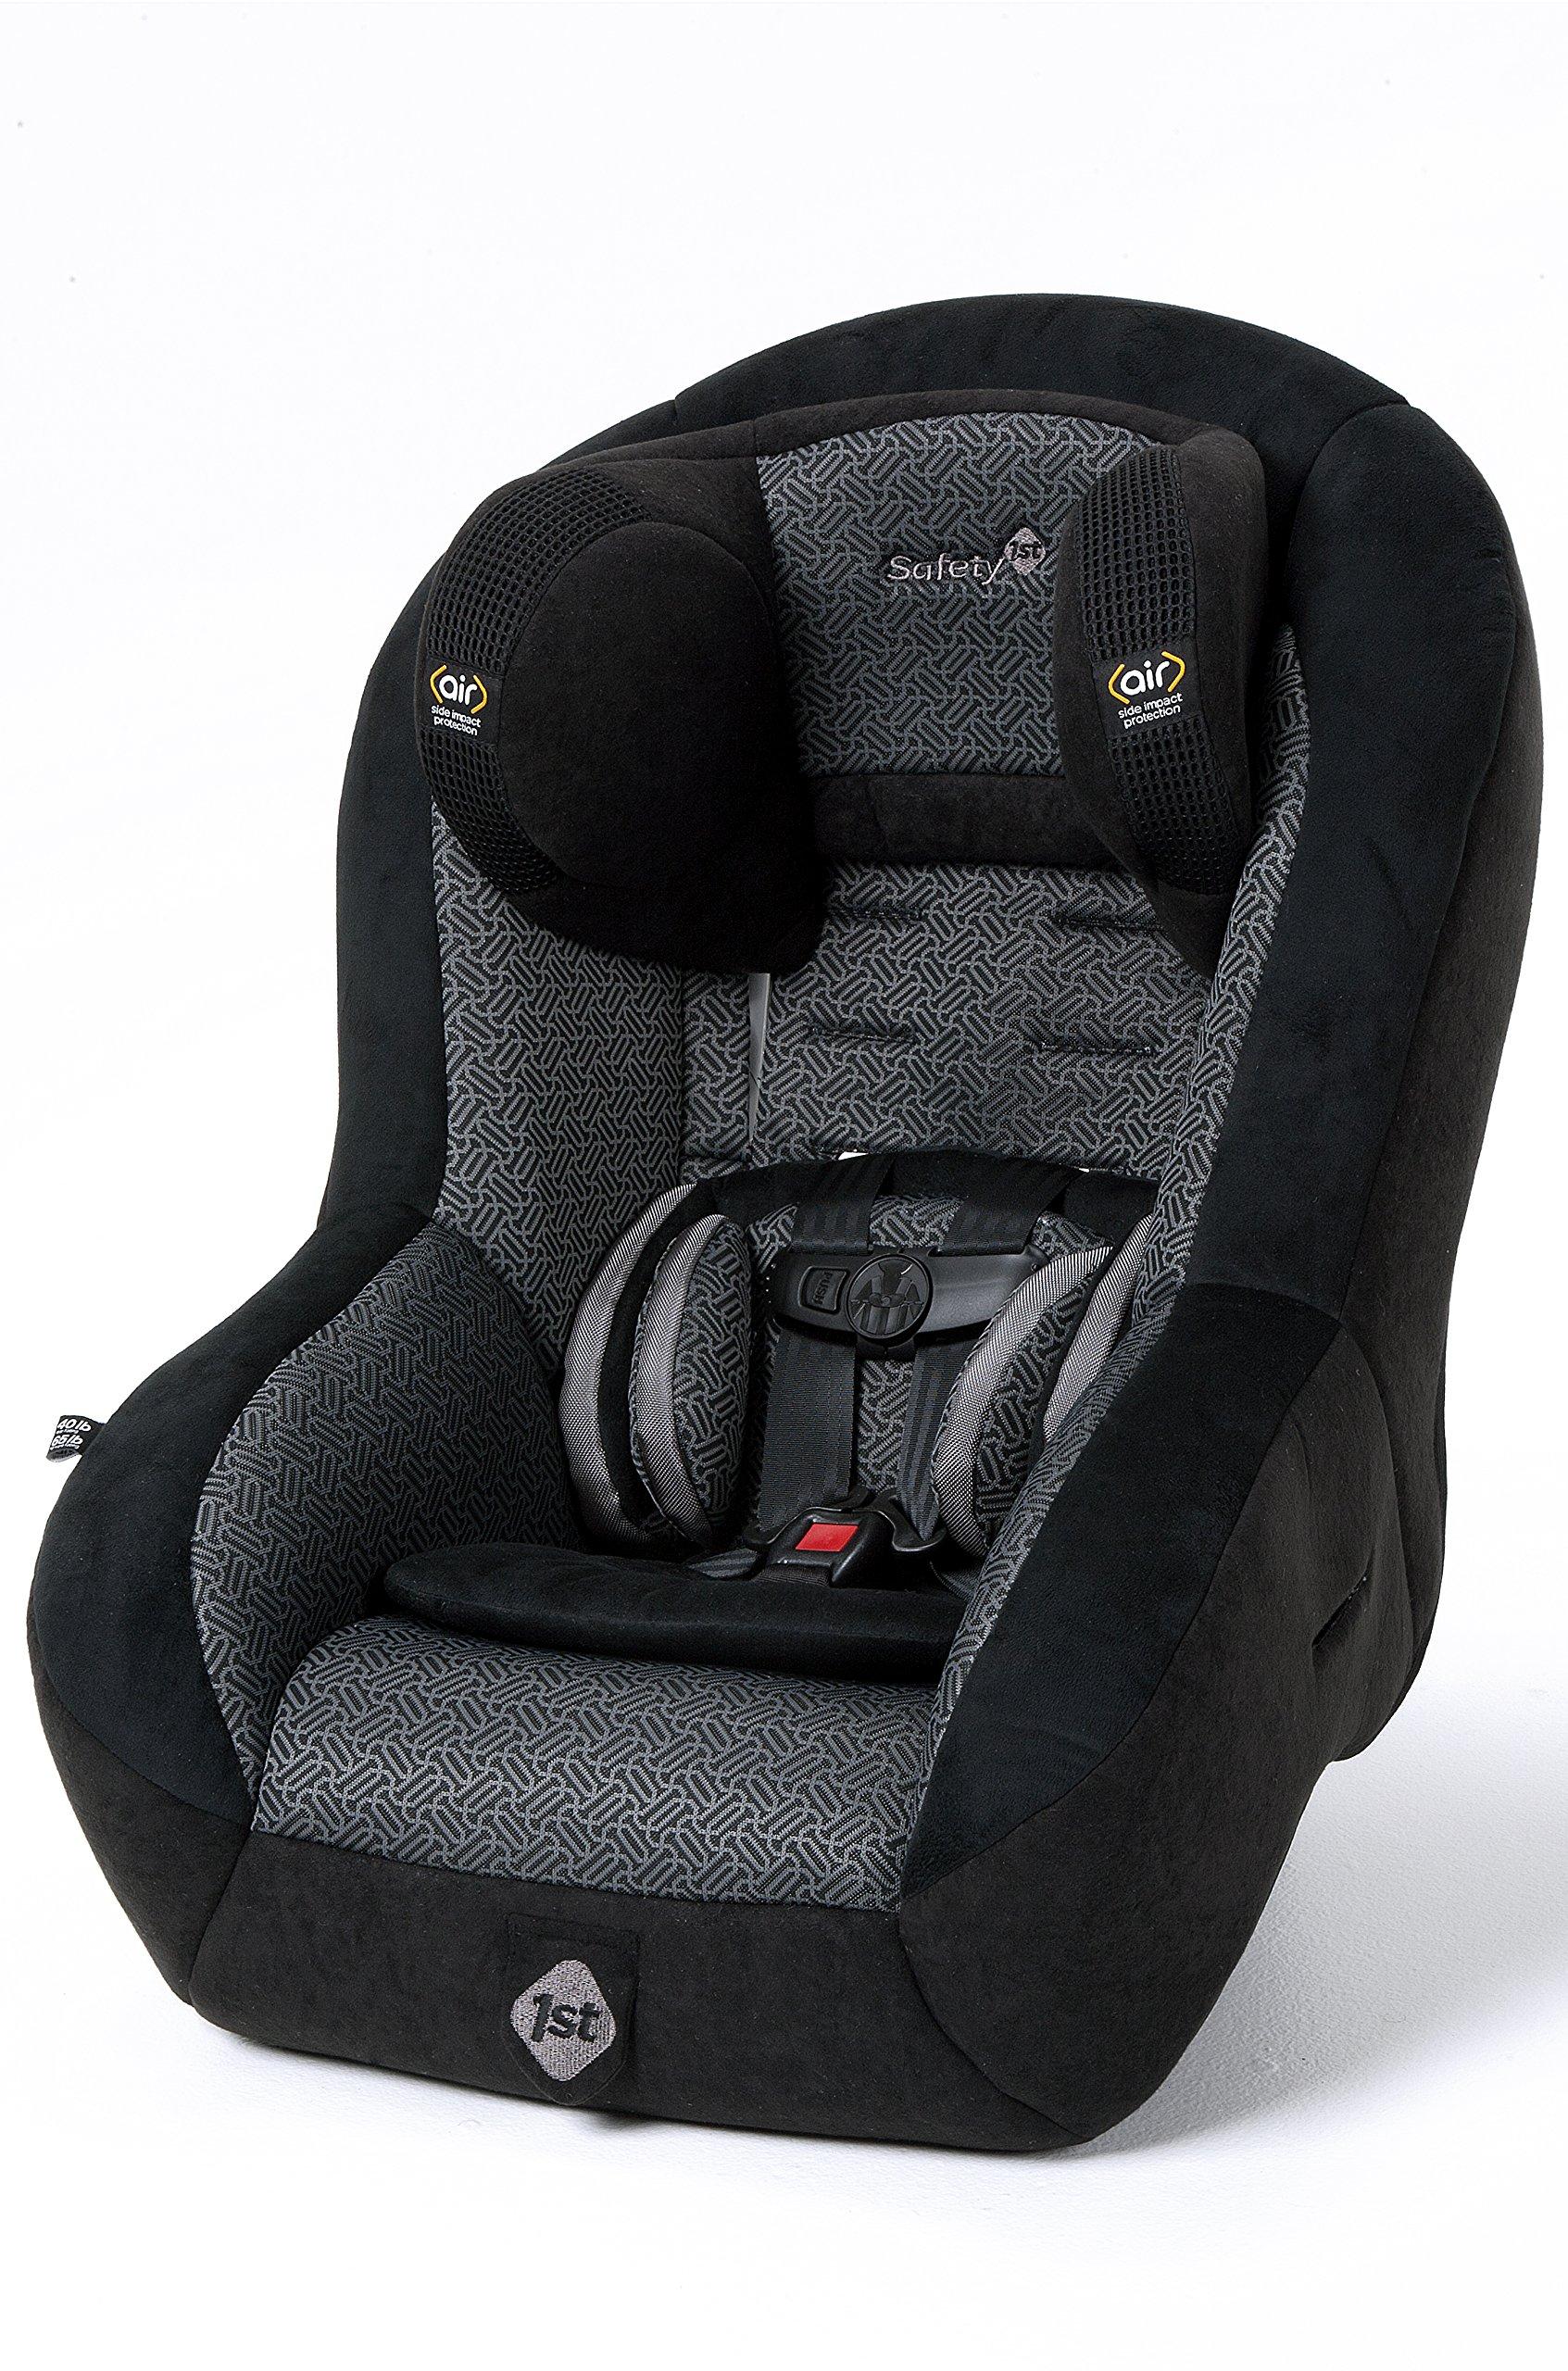 Safety 1st Chart Air 65 Convertible Car Seat, Wembley